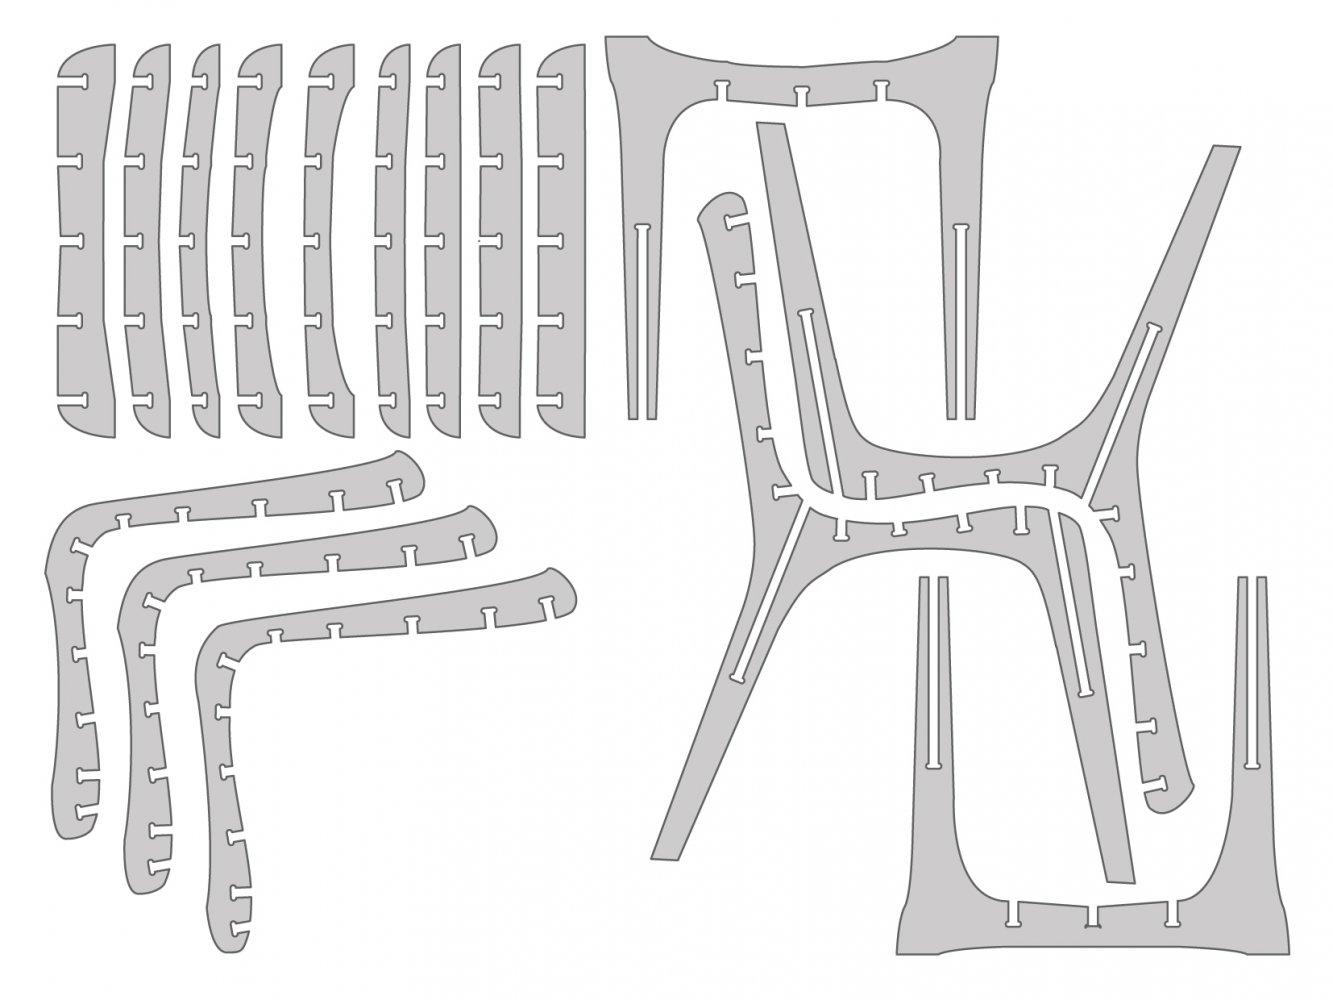 chair design program double seat folding beach roomeon blog sketch software tool für stuhl